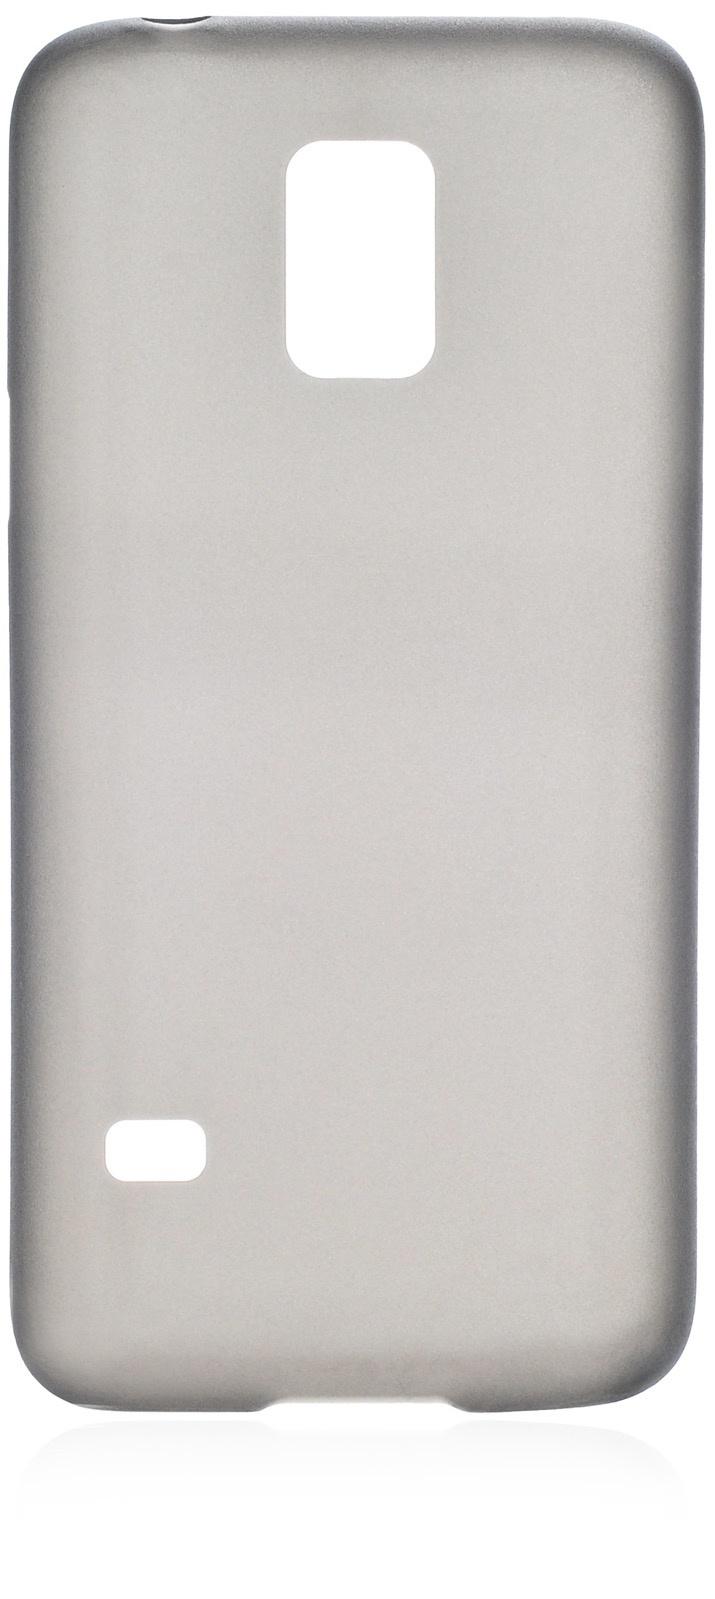 Чехол накладка iNeez пластик 0.3 мм 570009 для Samsung Galaxy S5 mini,570009, черный